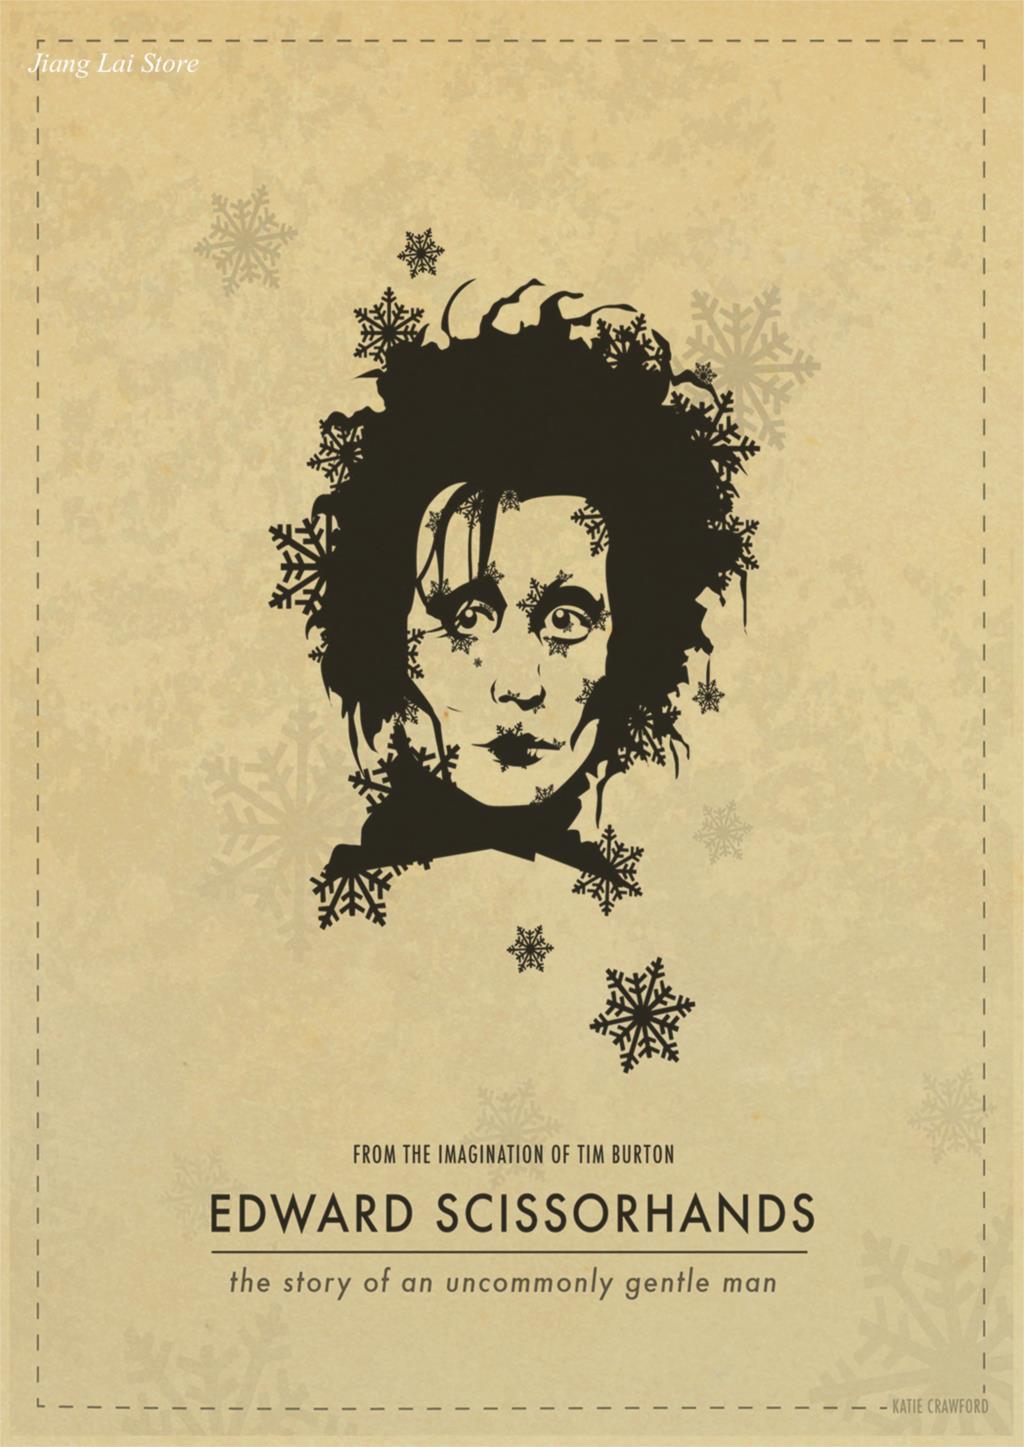 Tim Burton movies Beetlejuice Edward Scissorhands Poster Home Decor ...